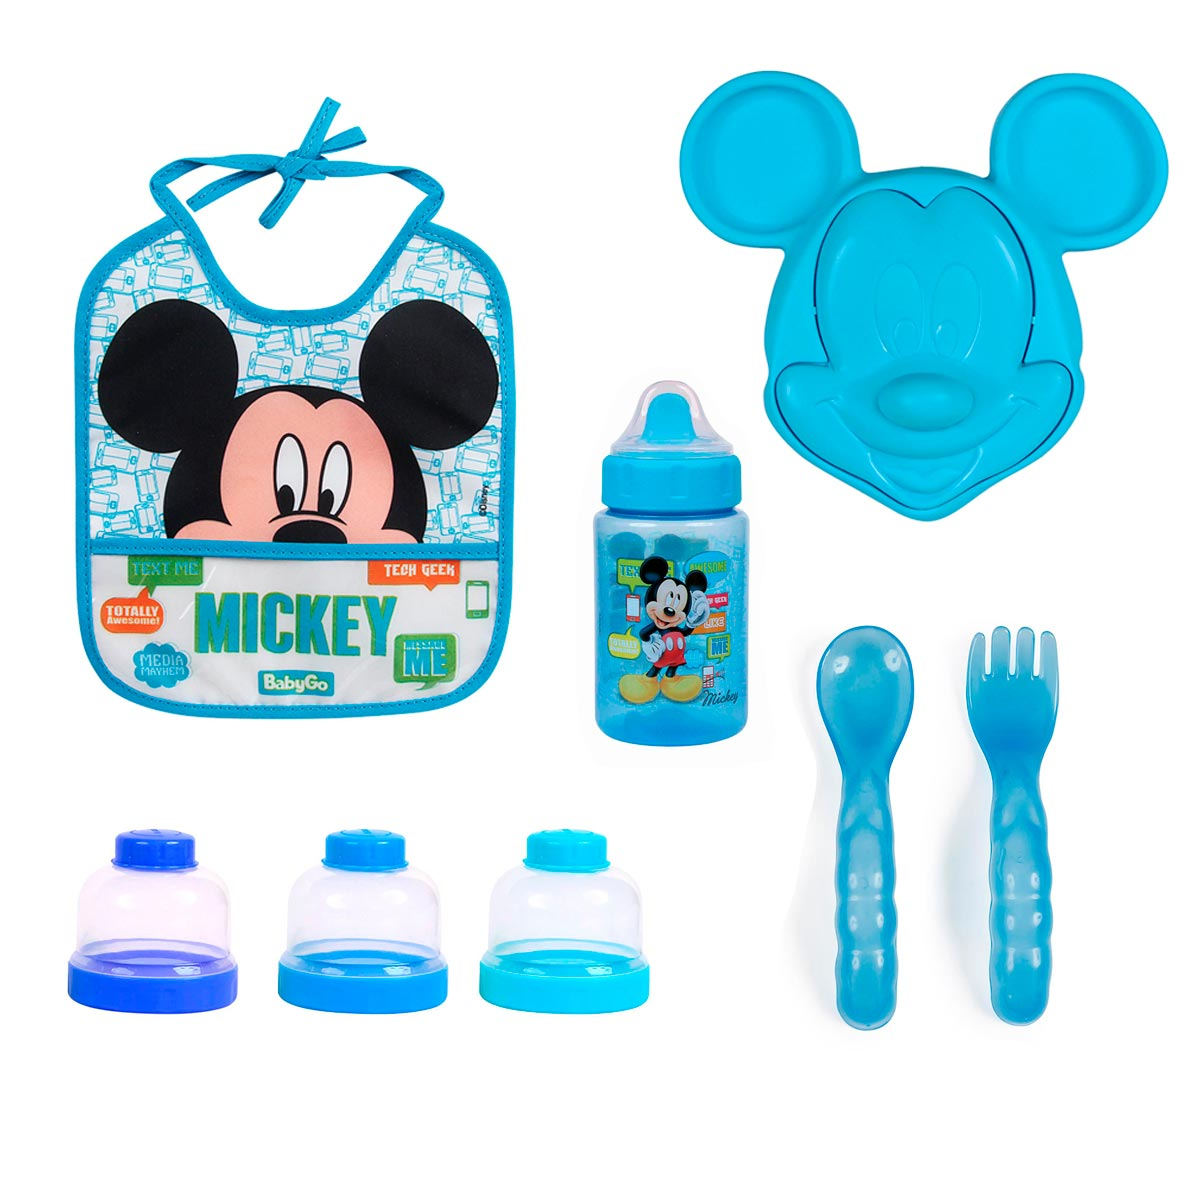 Kit Hora Da Papinha Mickey Mouse Disney